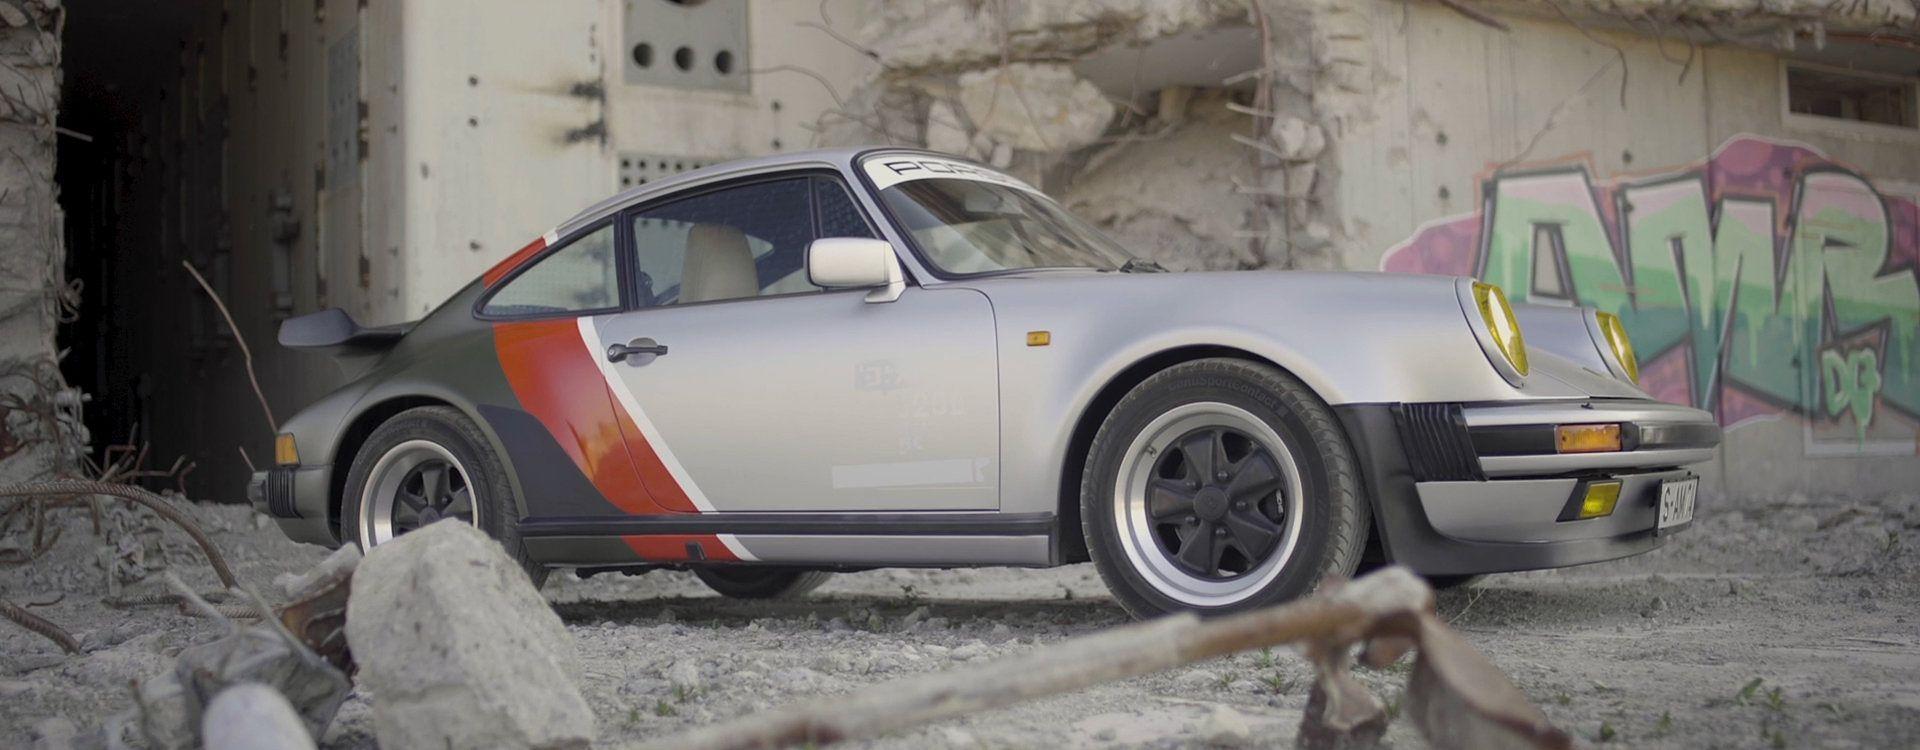 Porsche 911 Turbo z gry Cyberpunk 2077